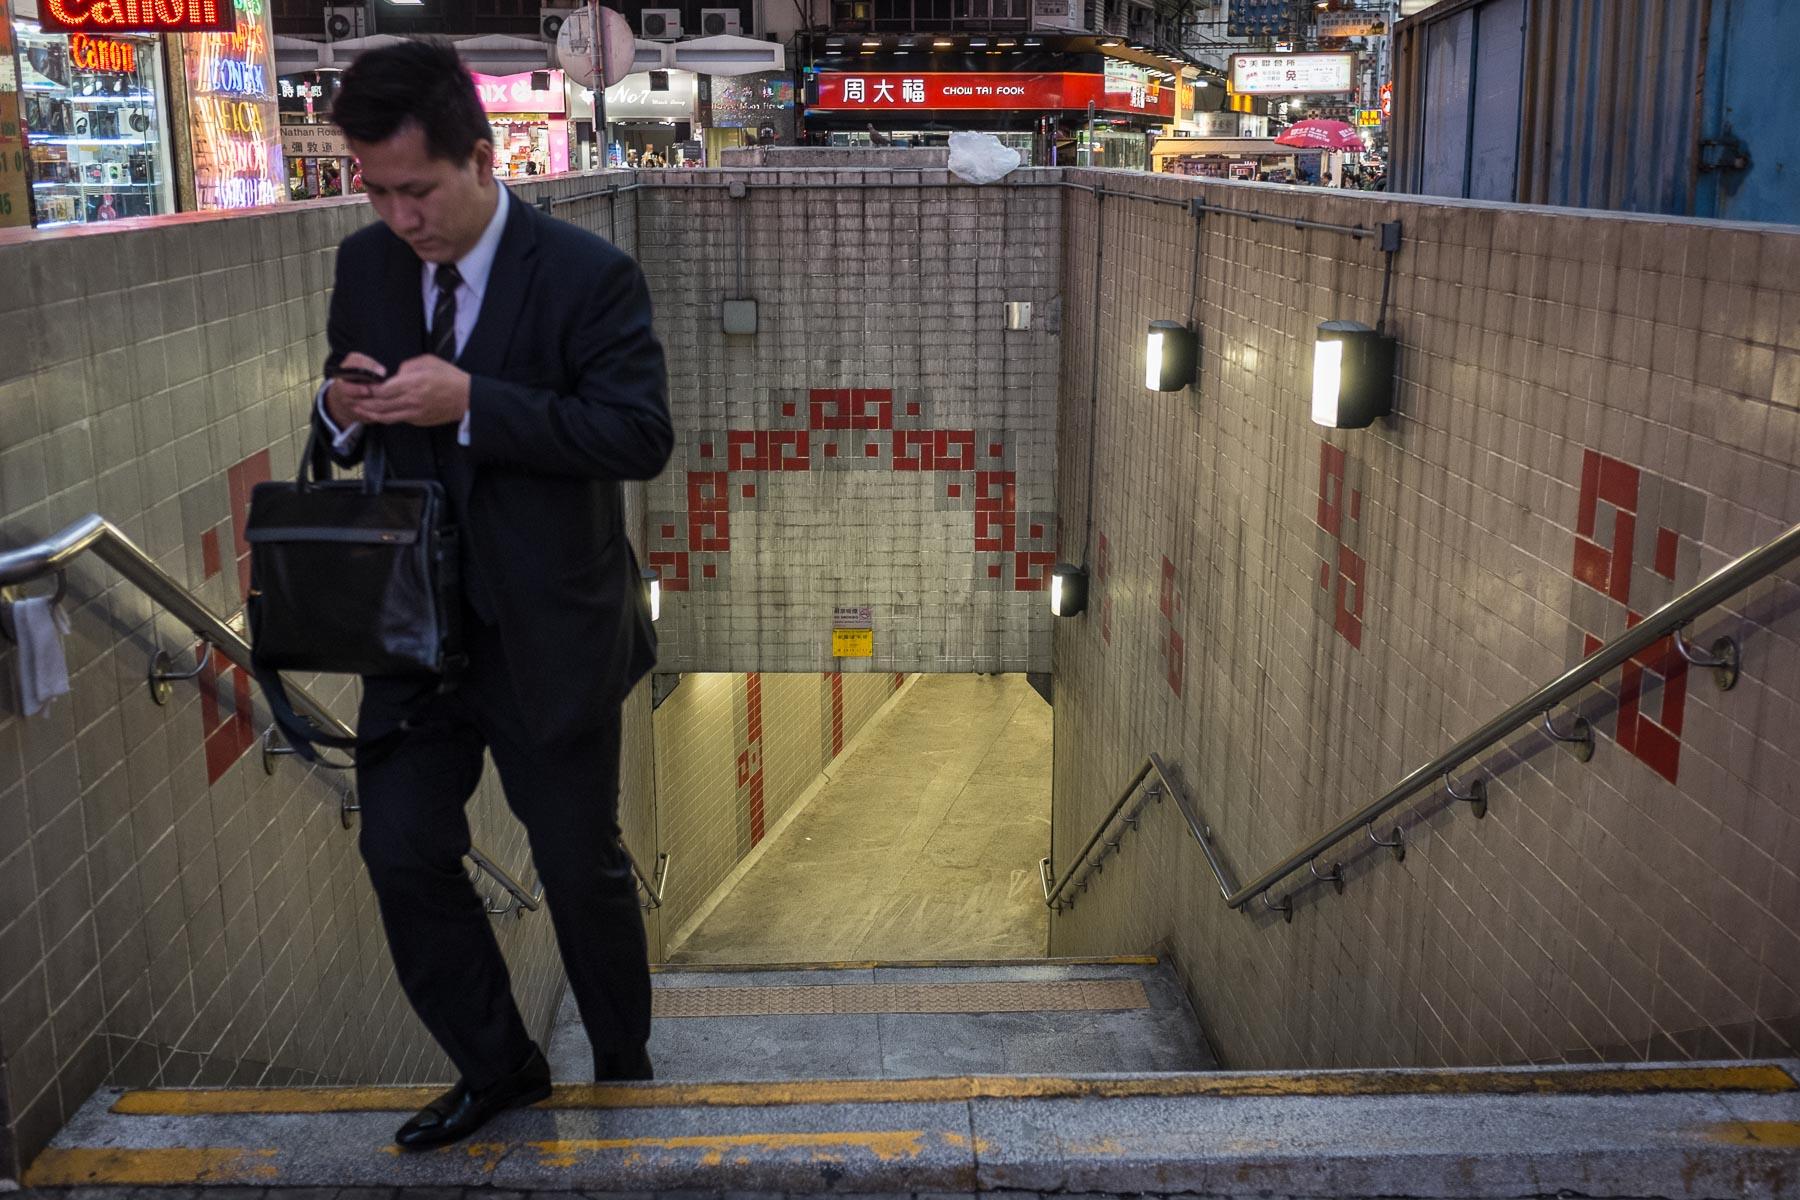 Kowloon Subway Guy